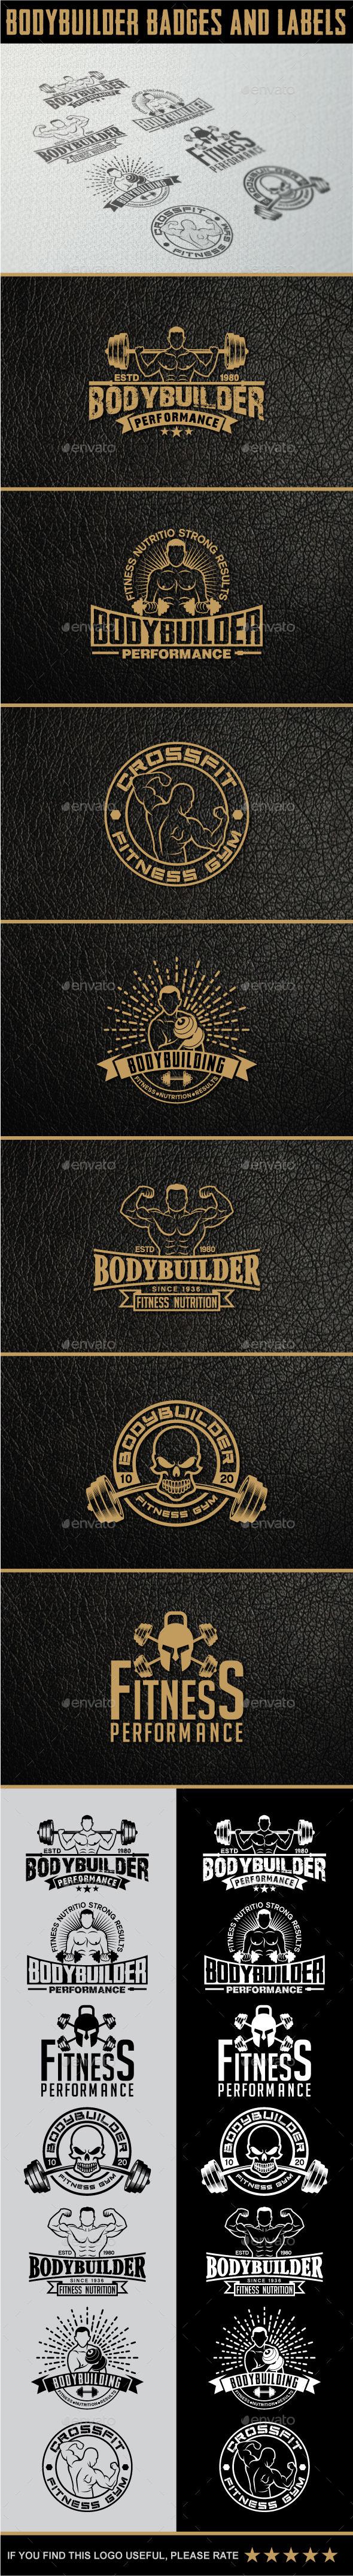 GraphicRiver Bodybuilding Labels & Badges 11643515